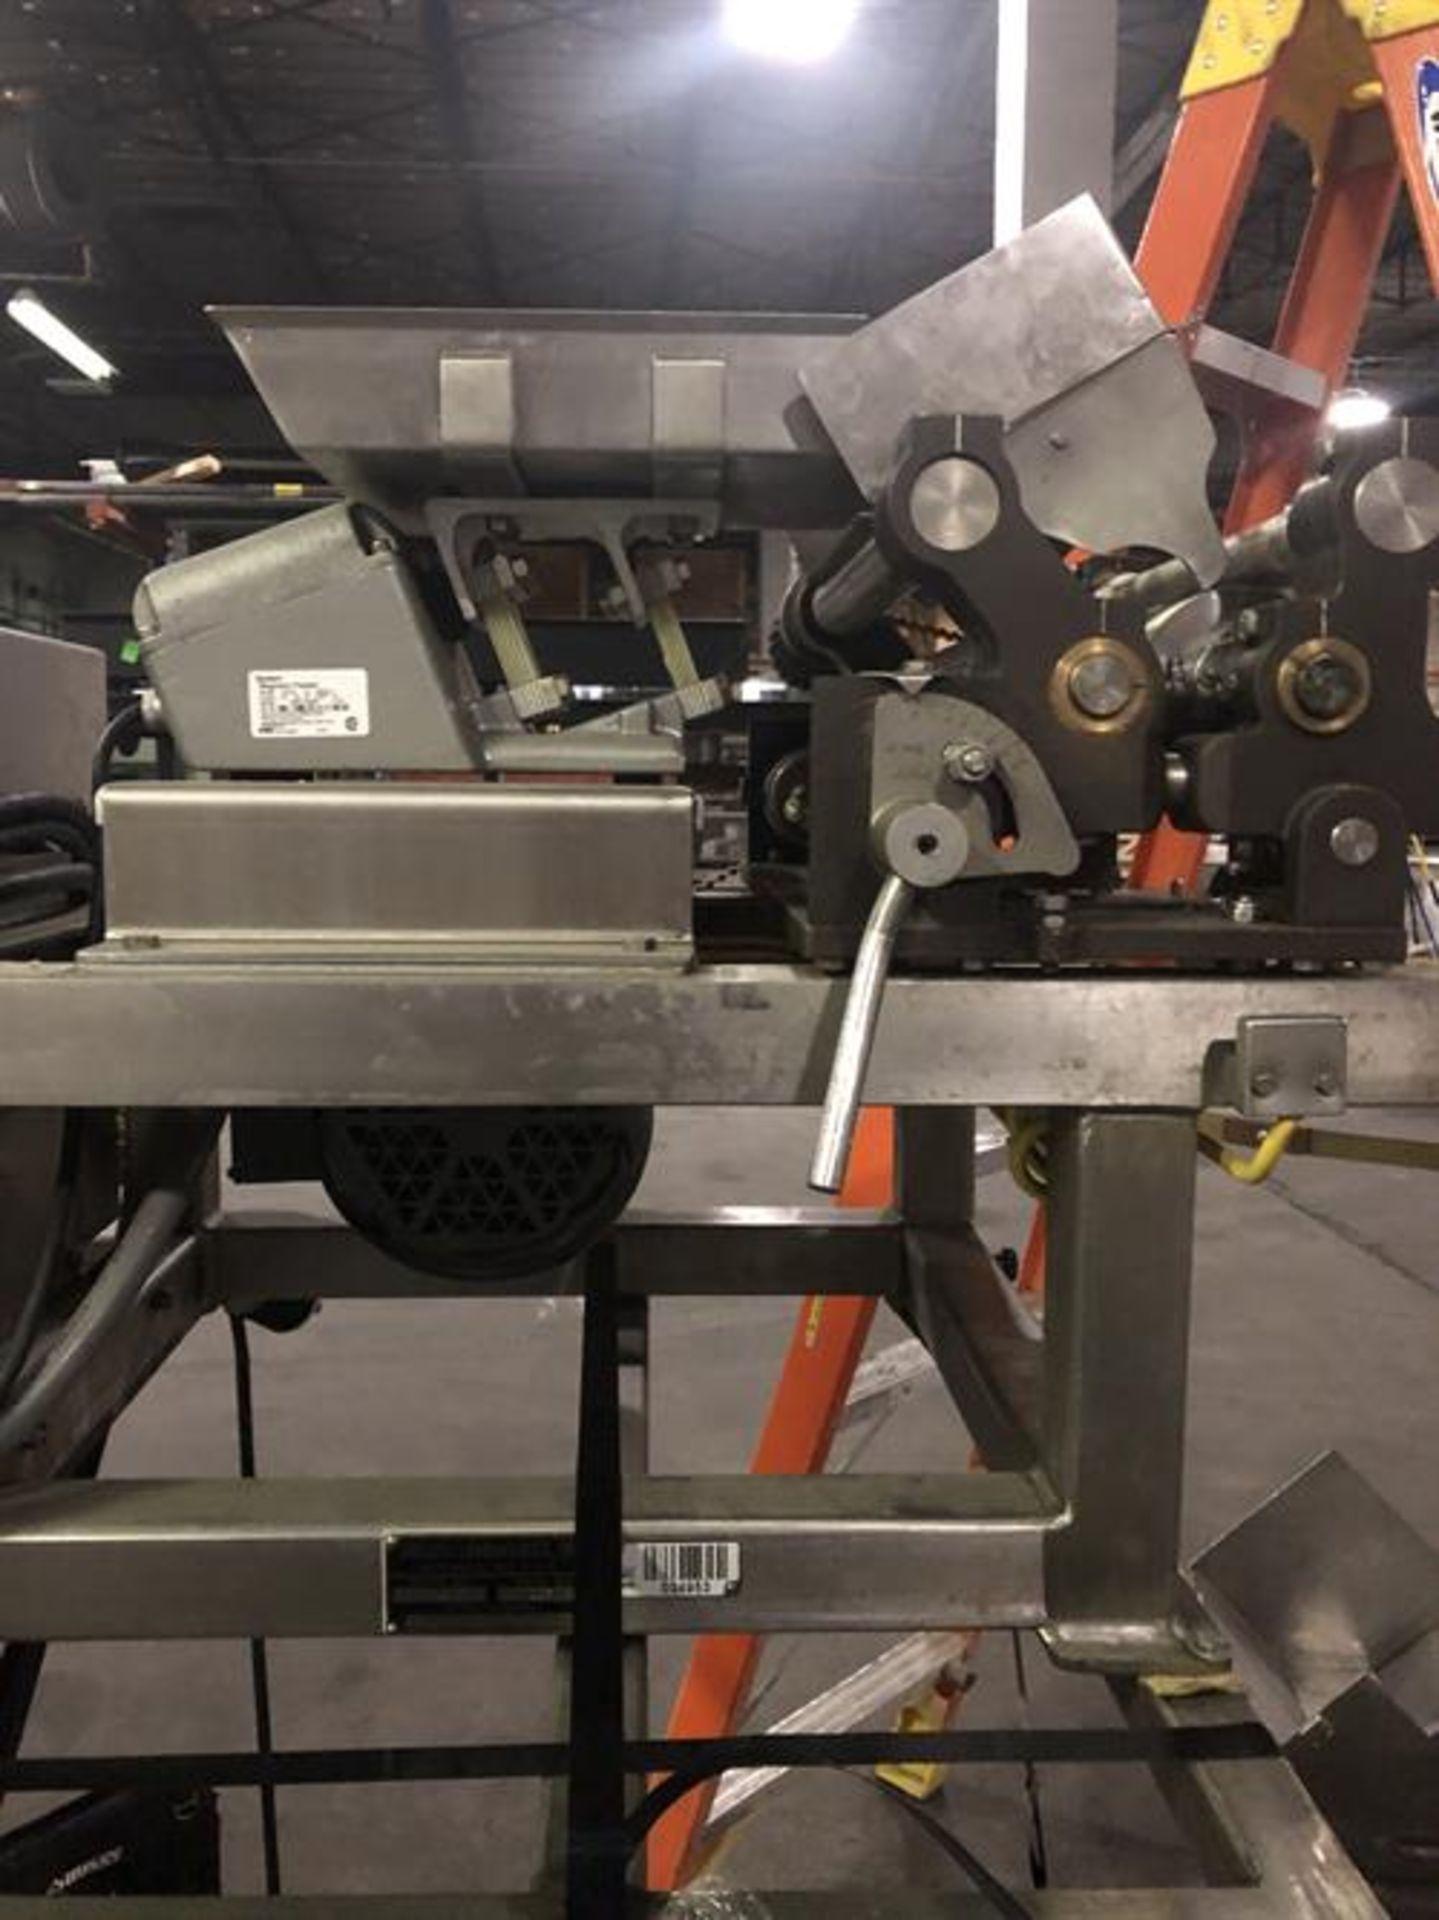 Urschel model N Stainless Steel Granulator - Vibrator pan feeder with variable speed rheostat - - Image 5 of 18